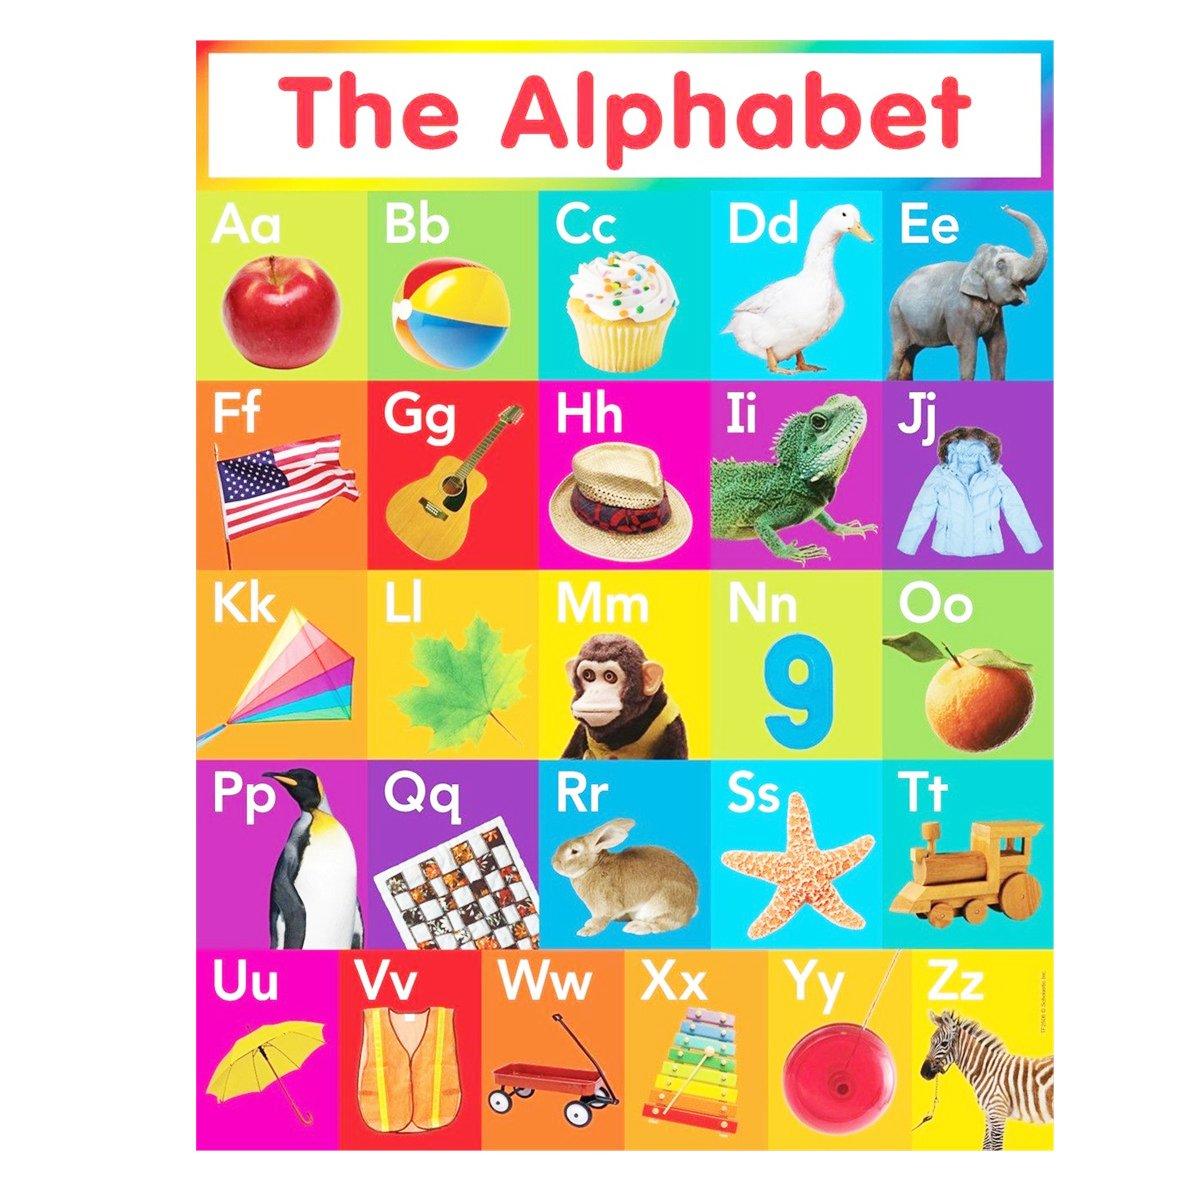 60x90cm ABC Alphabet Learn Children/'s Educational Silk Cloth Poster Art Room Bed